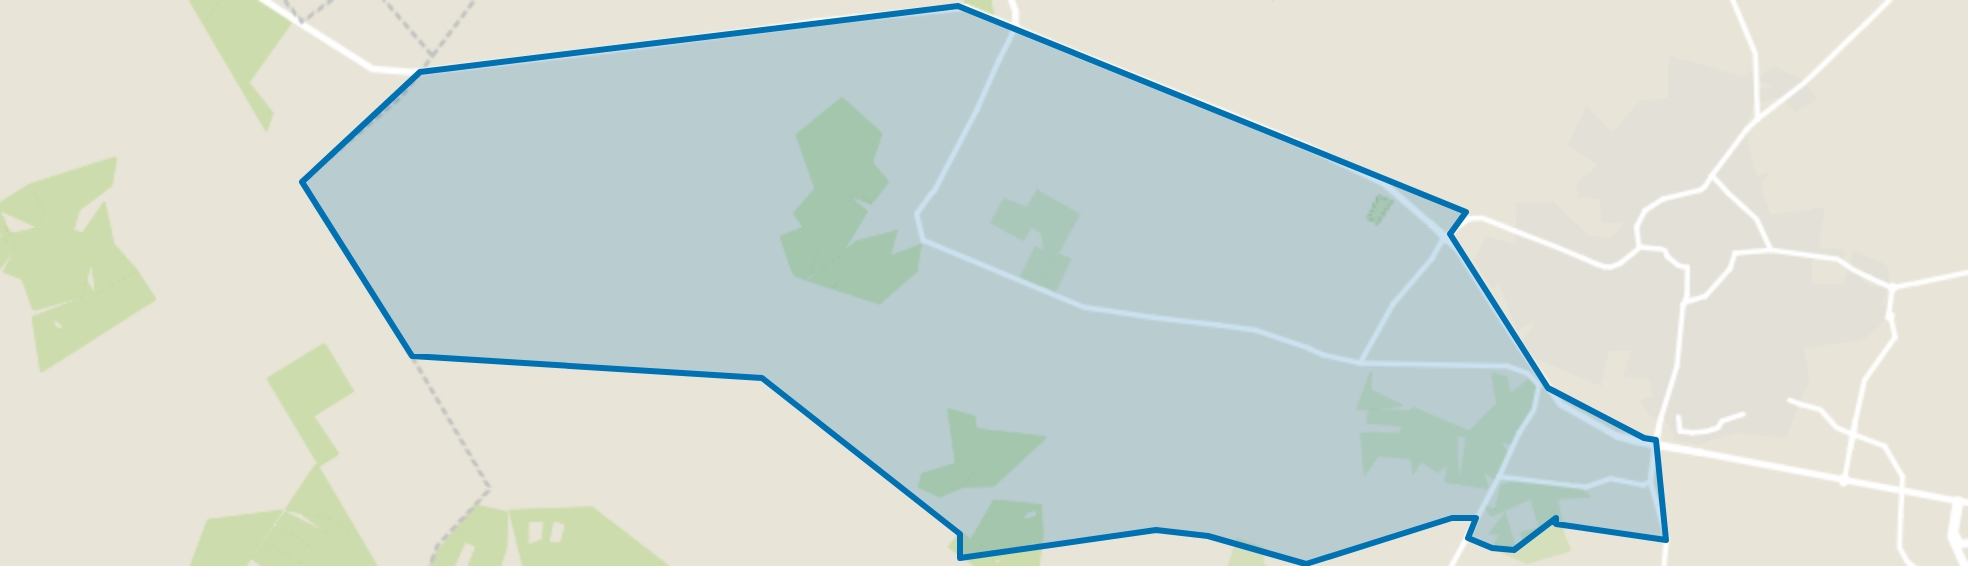 Buitengebied Epe West, Epe map